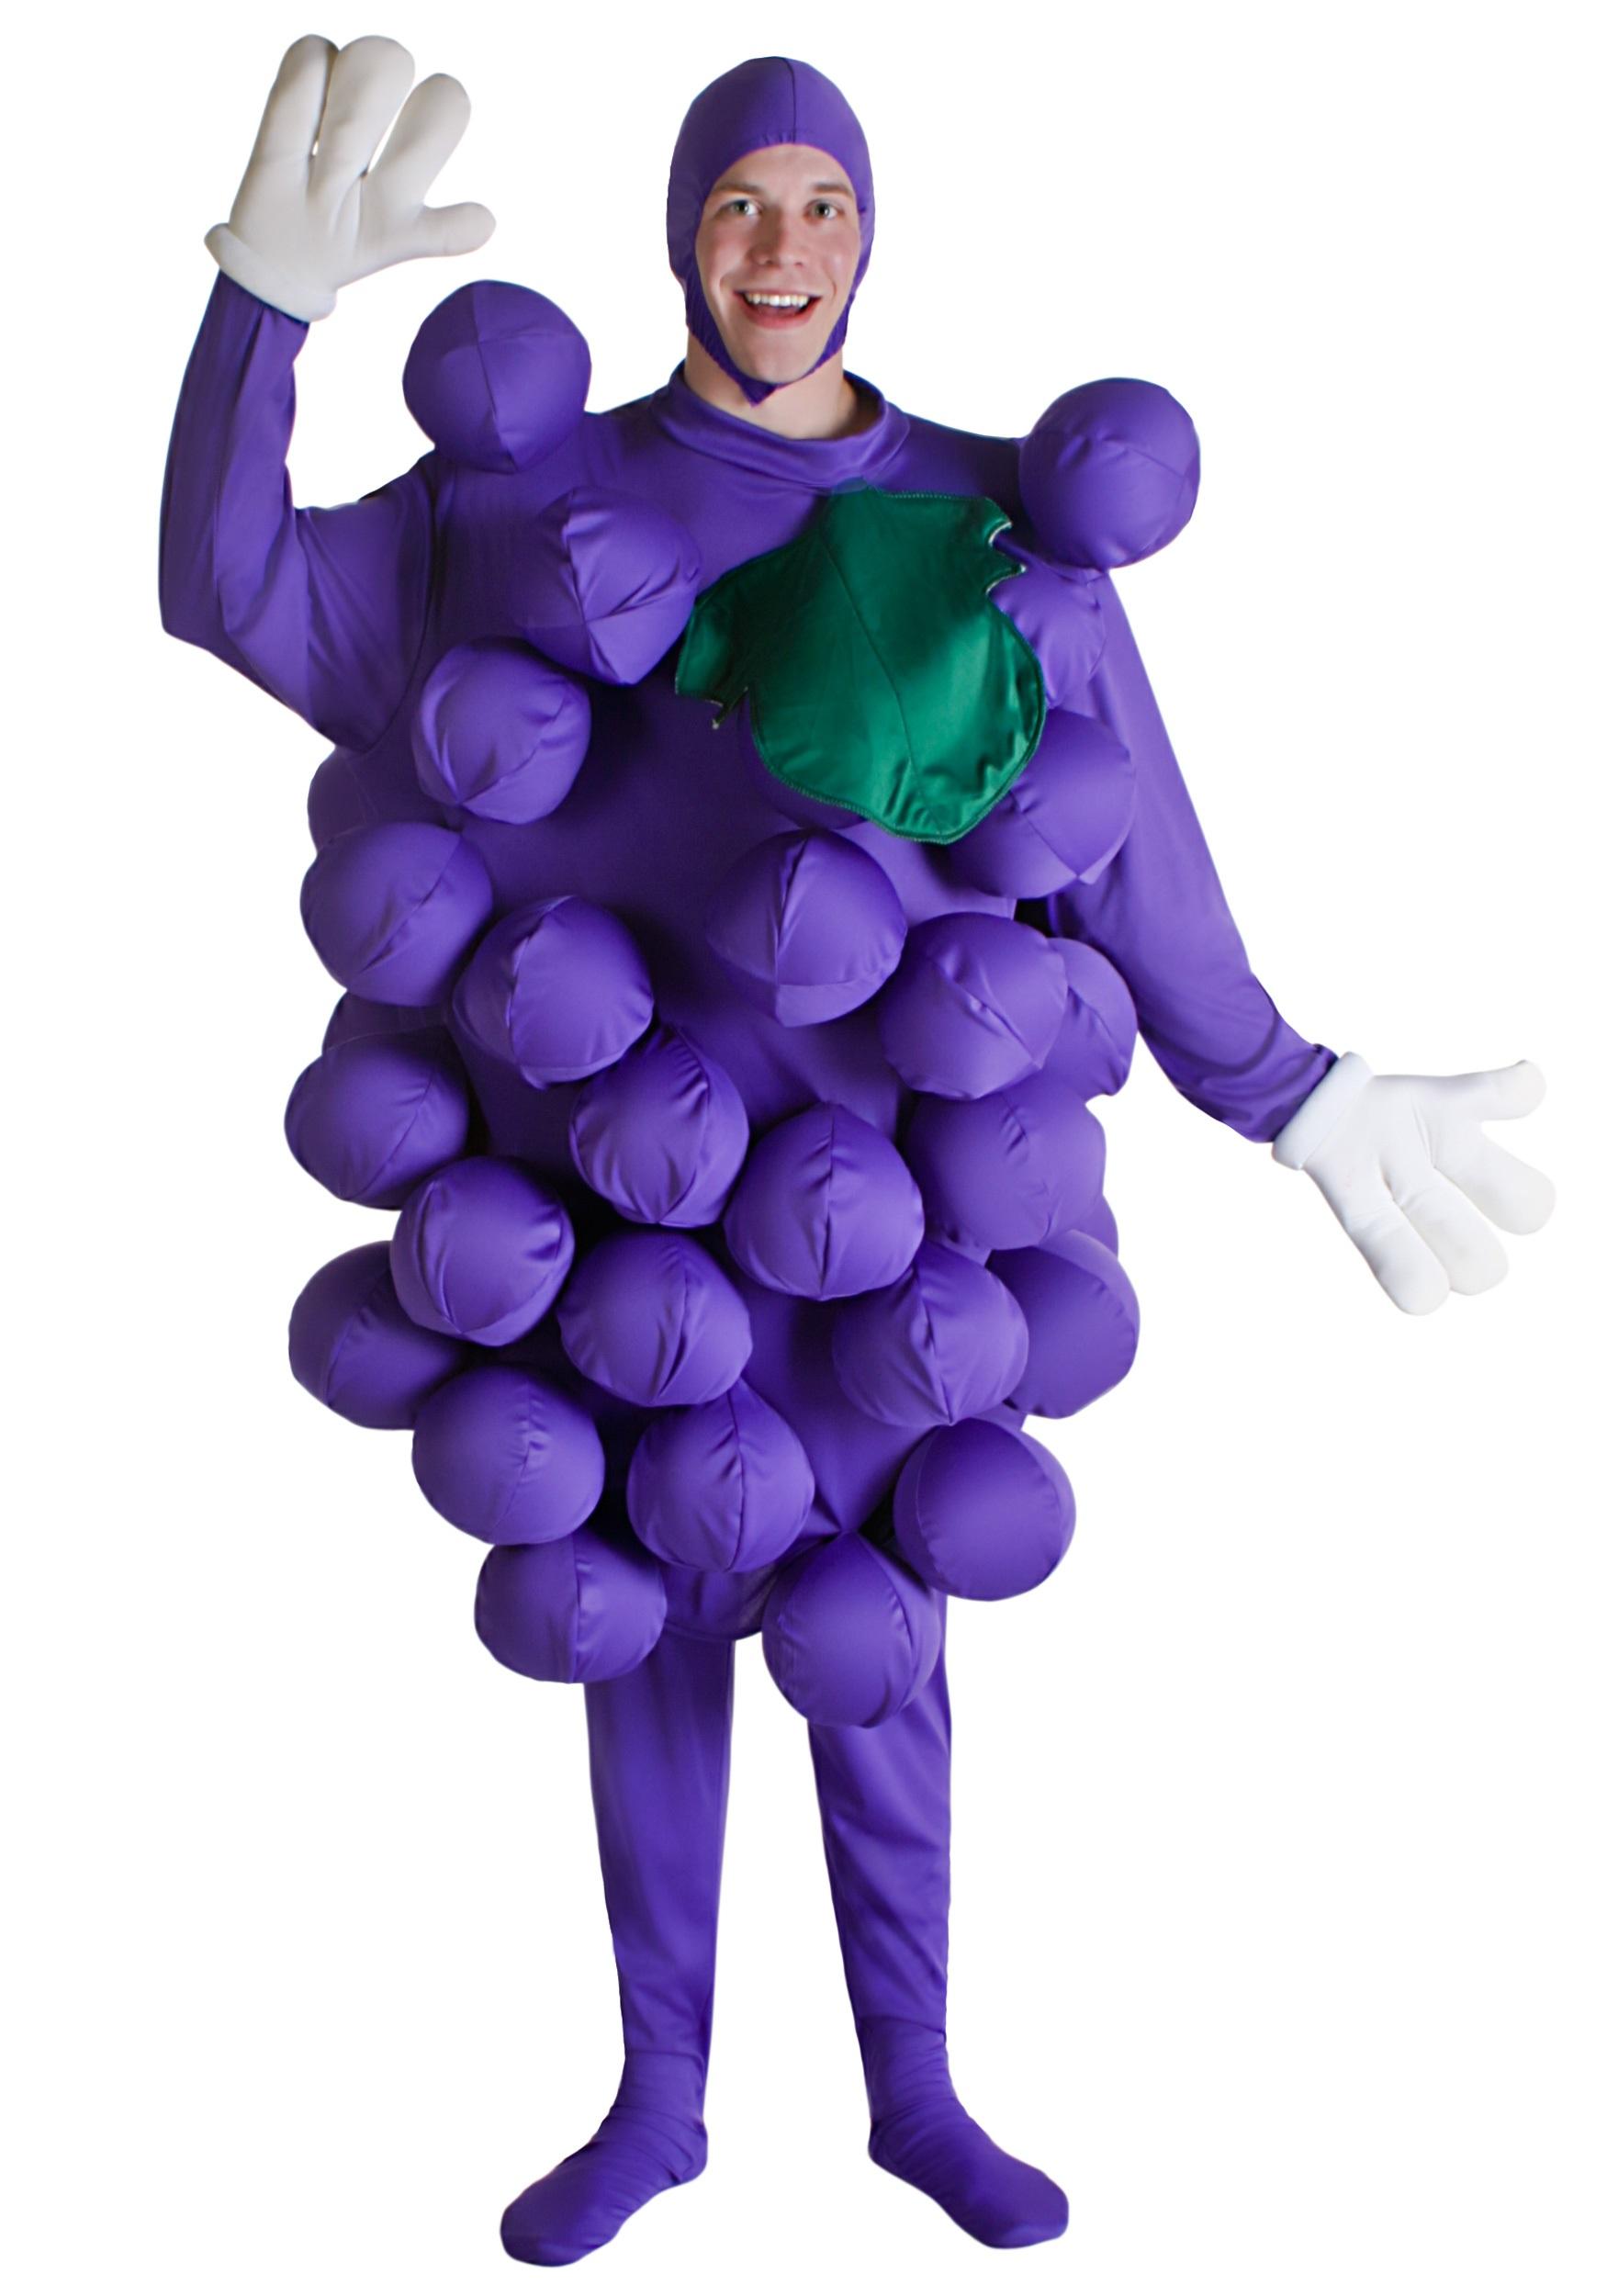 Food Costumes - Adult, Kids Food and Drink Halloween Costume Ideas